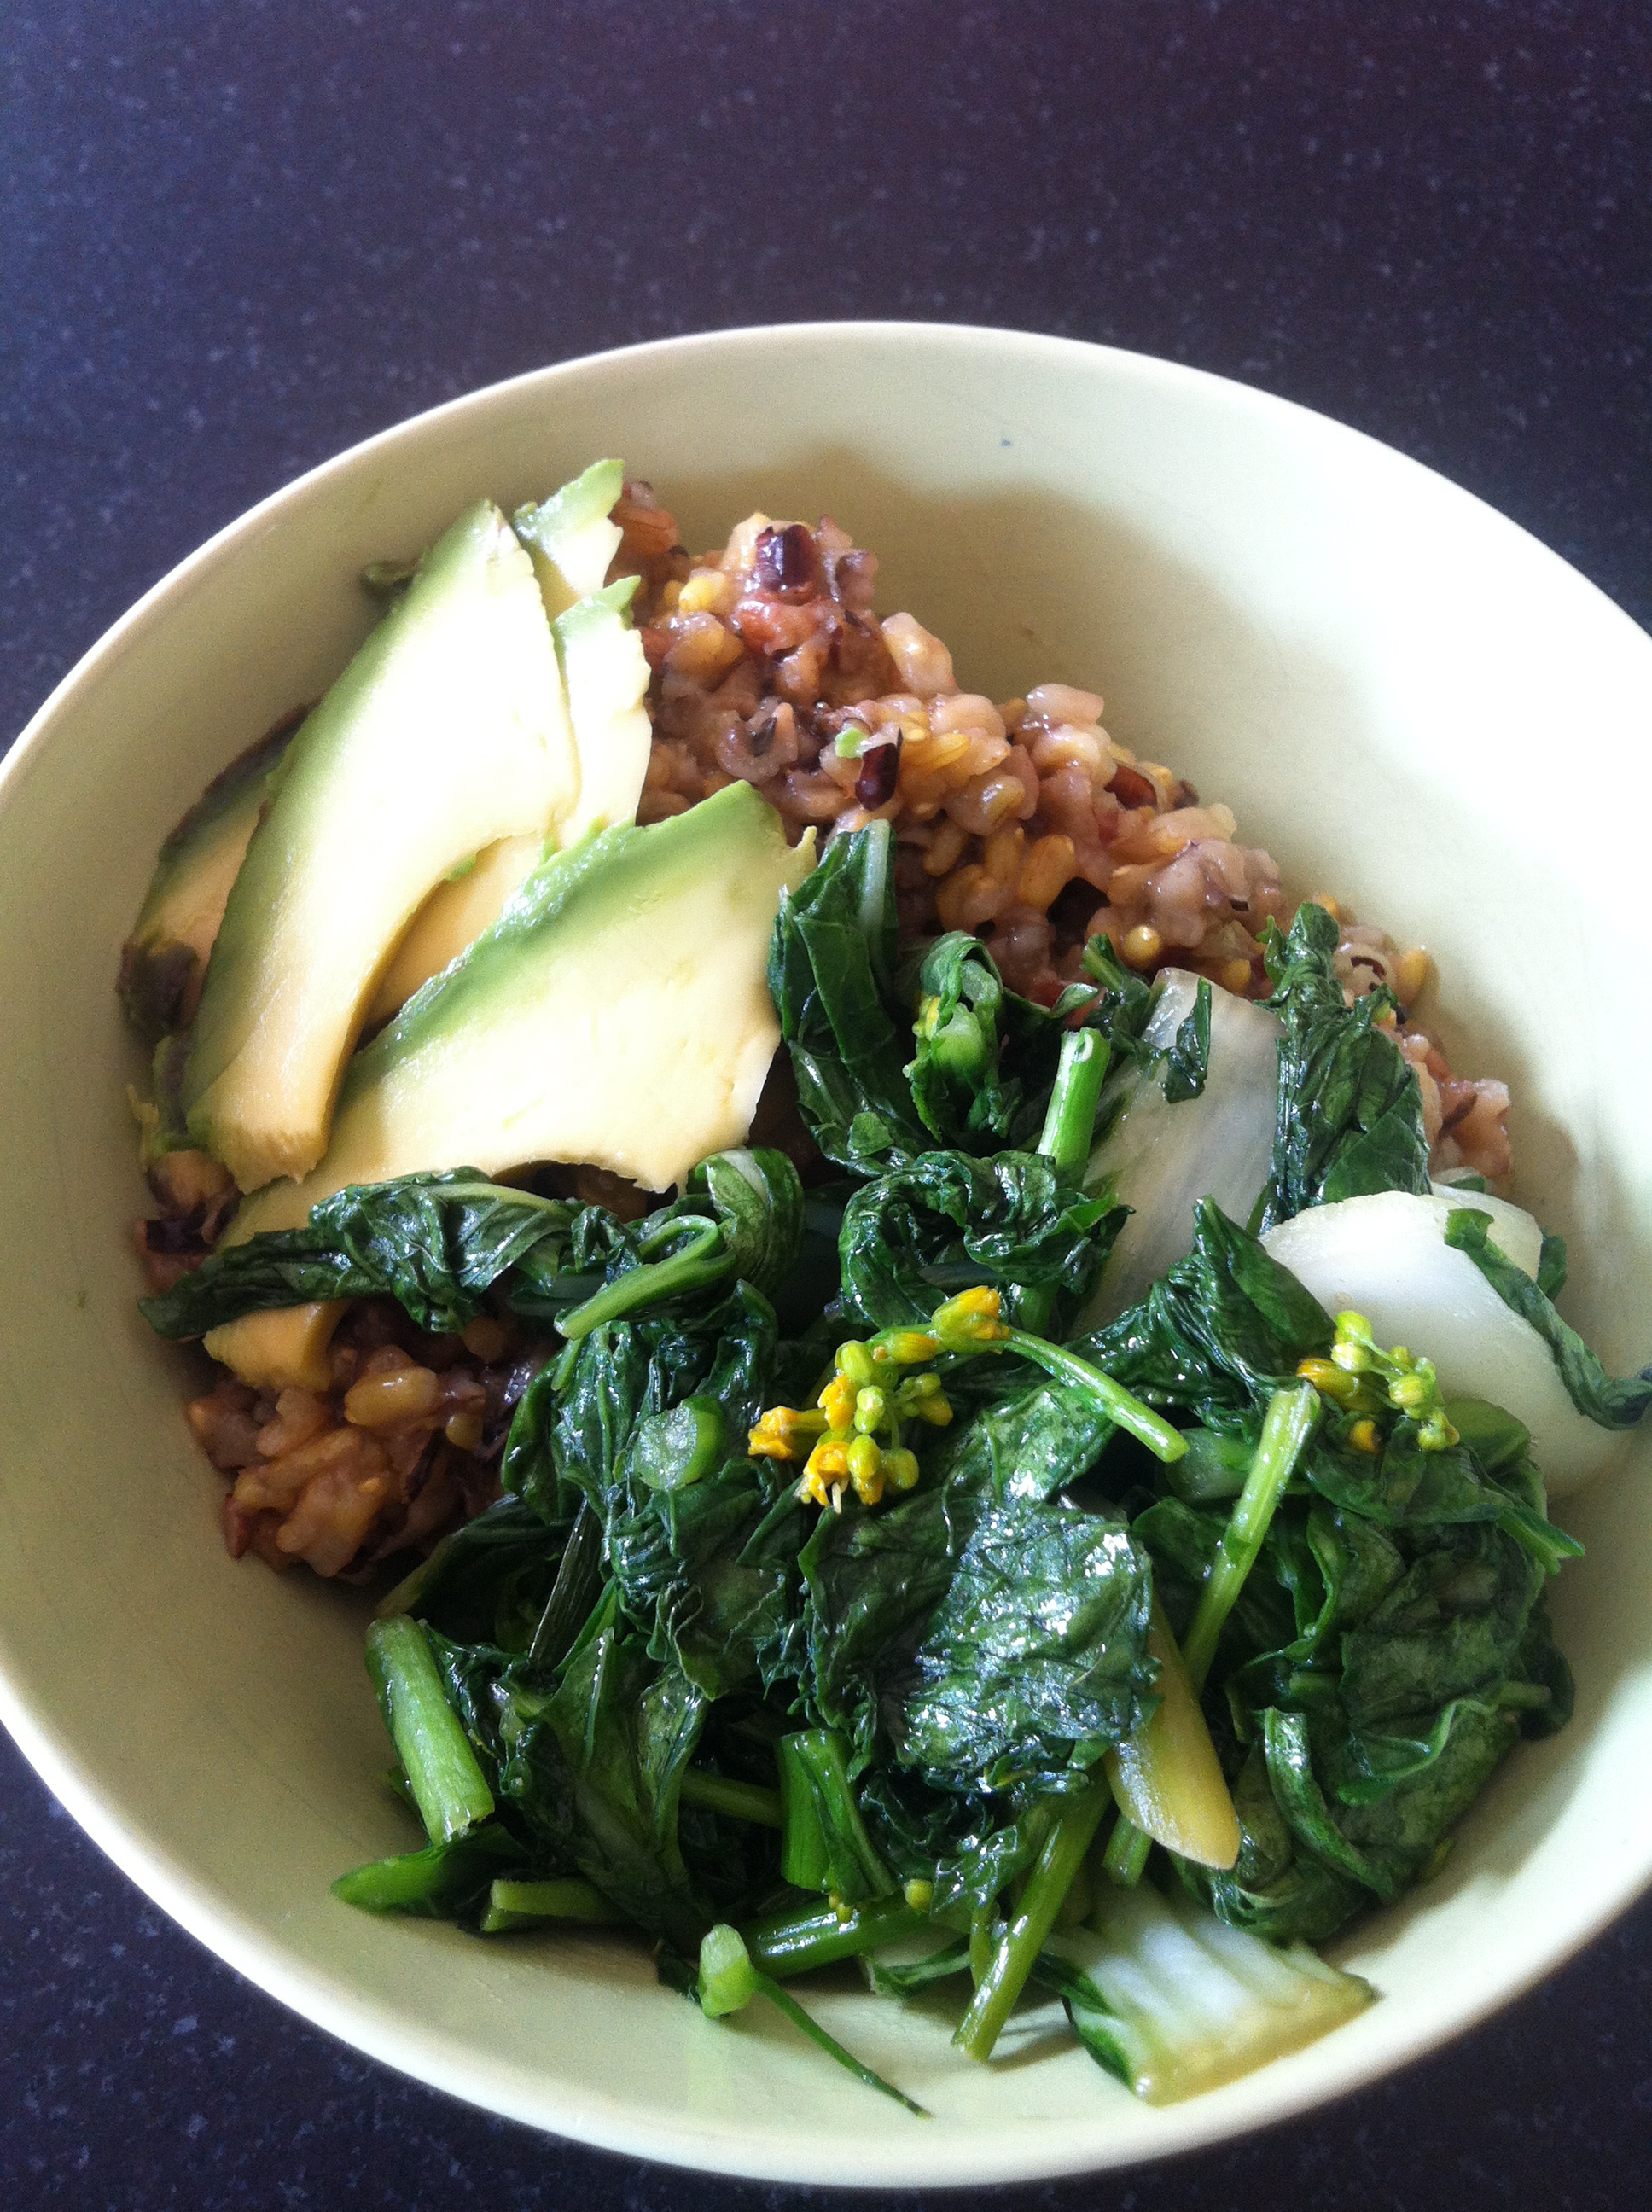 Rice bowl goodness.